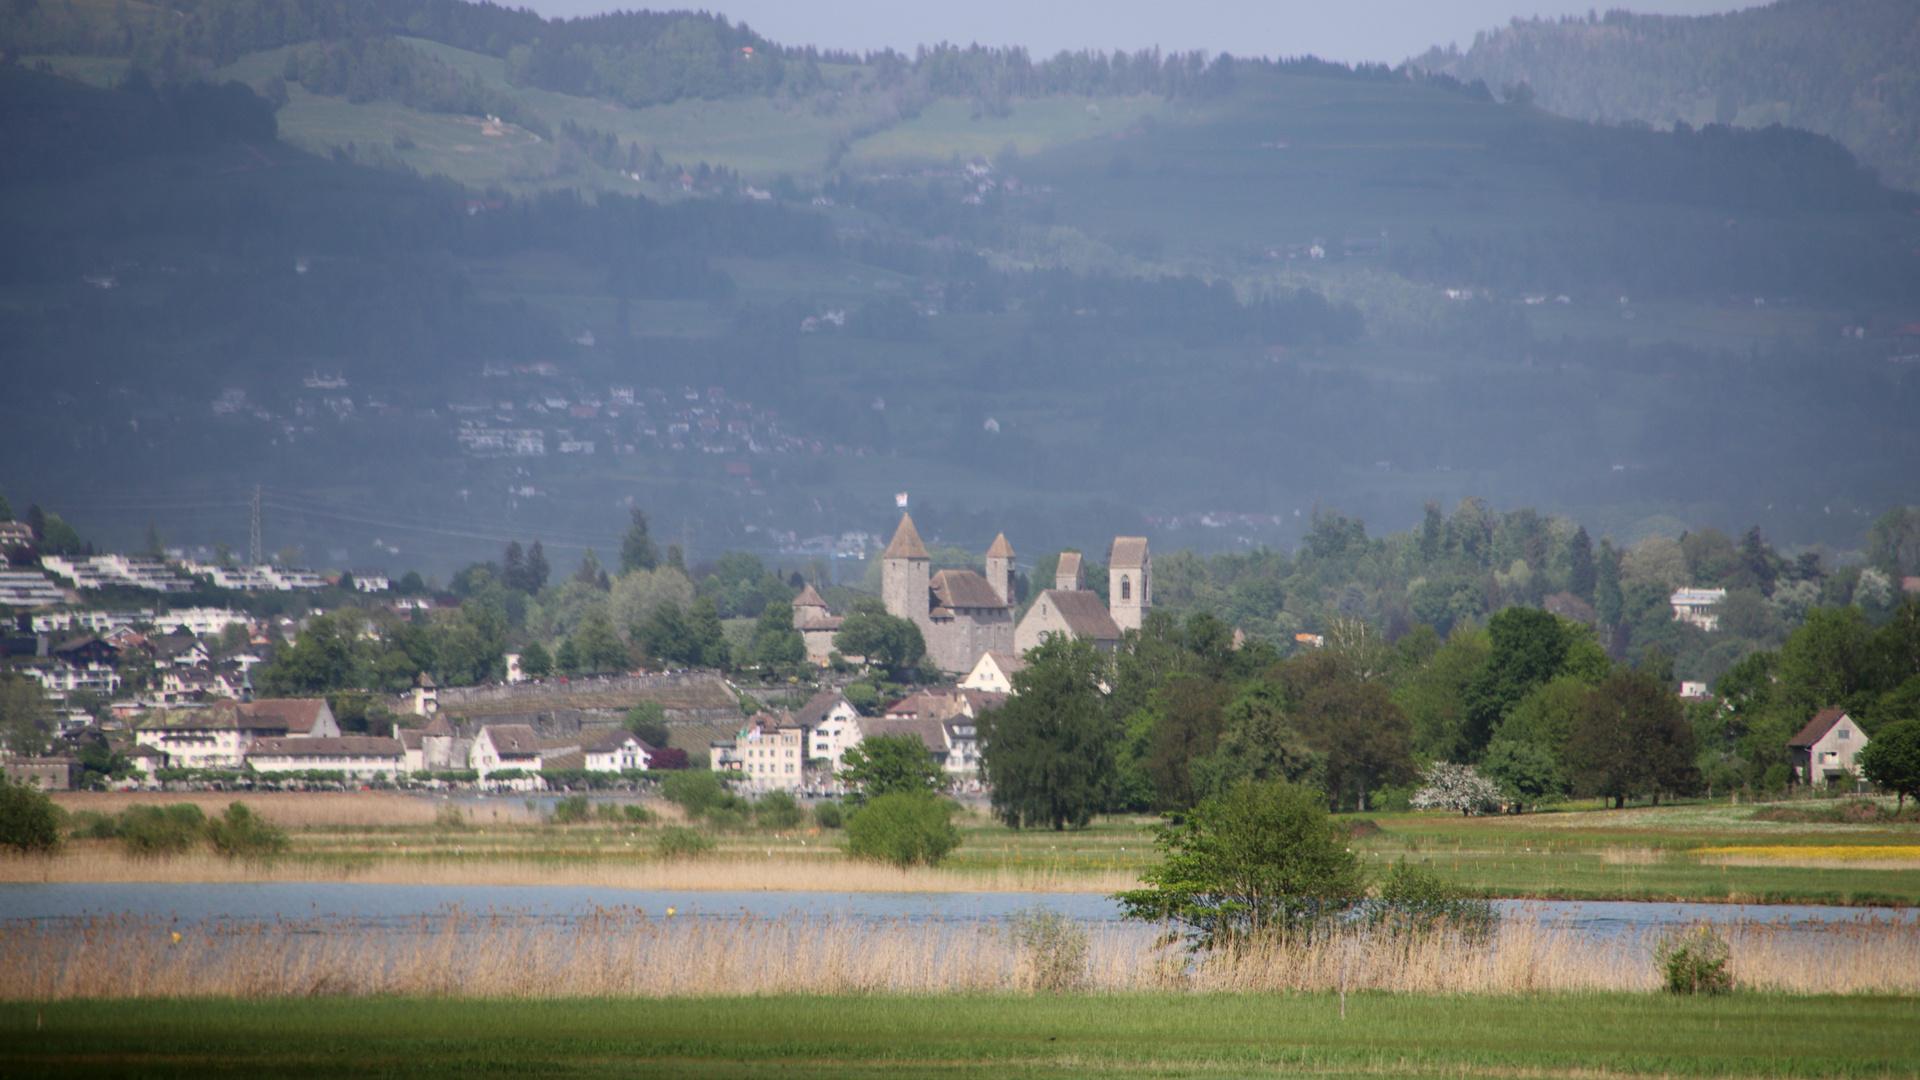 Blick auf Schloss Rapperswil